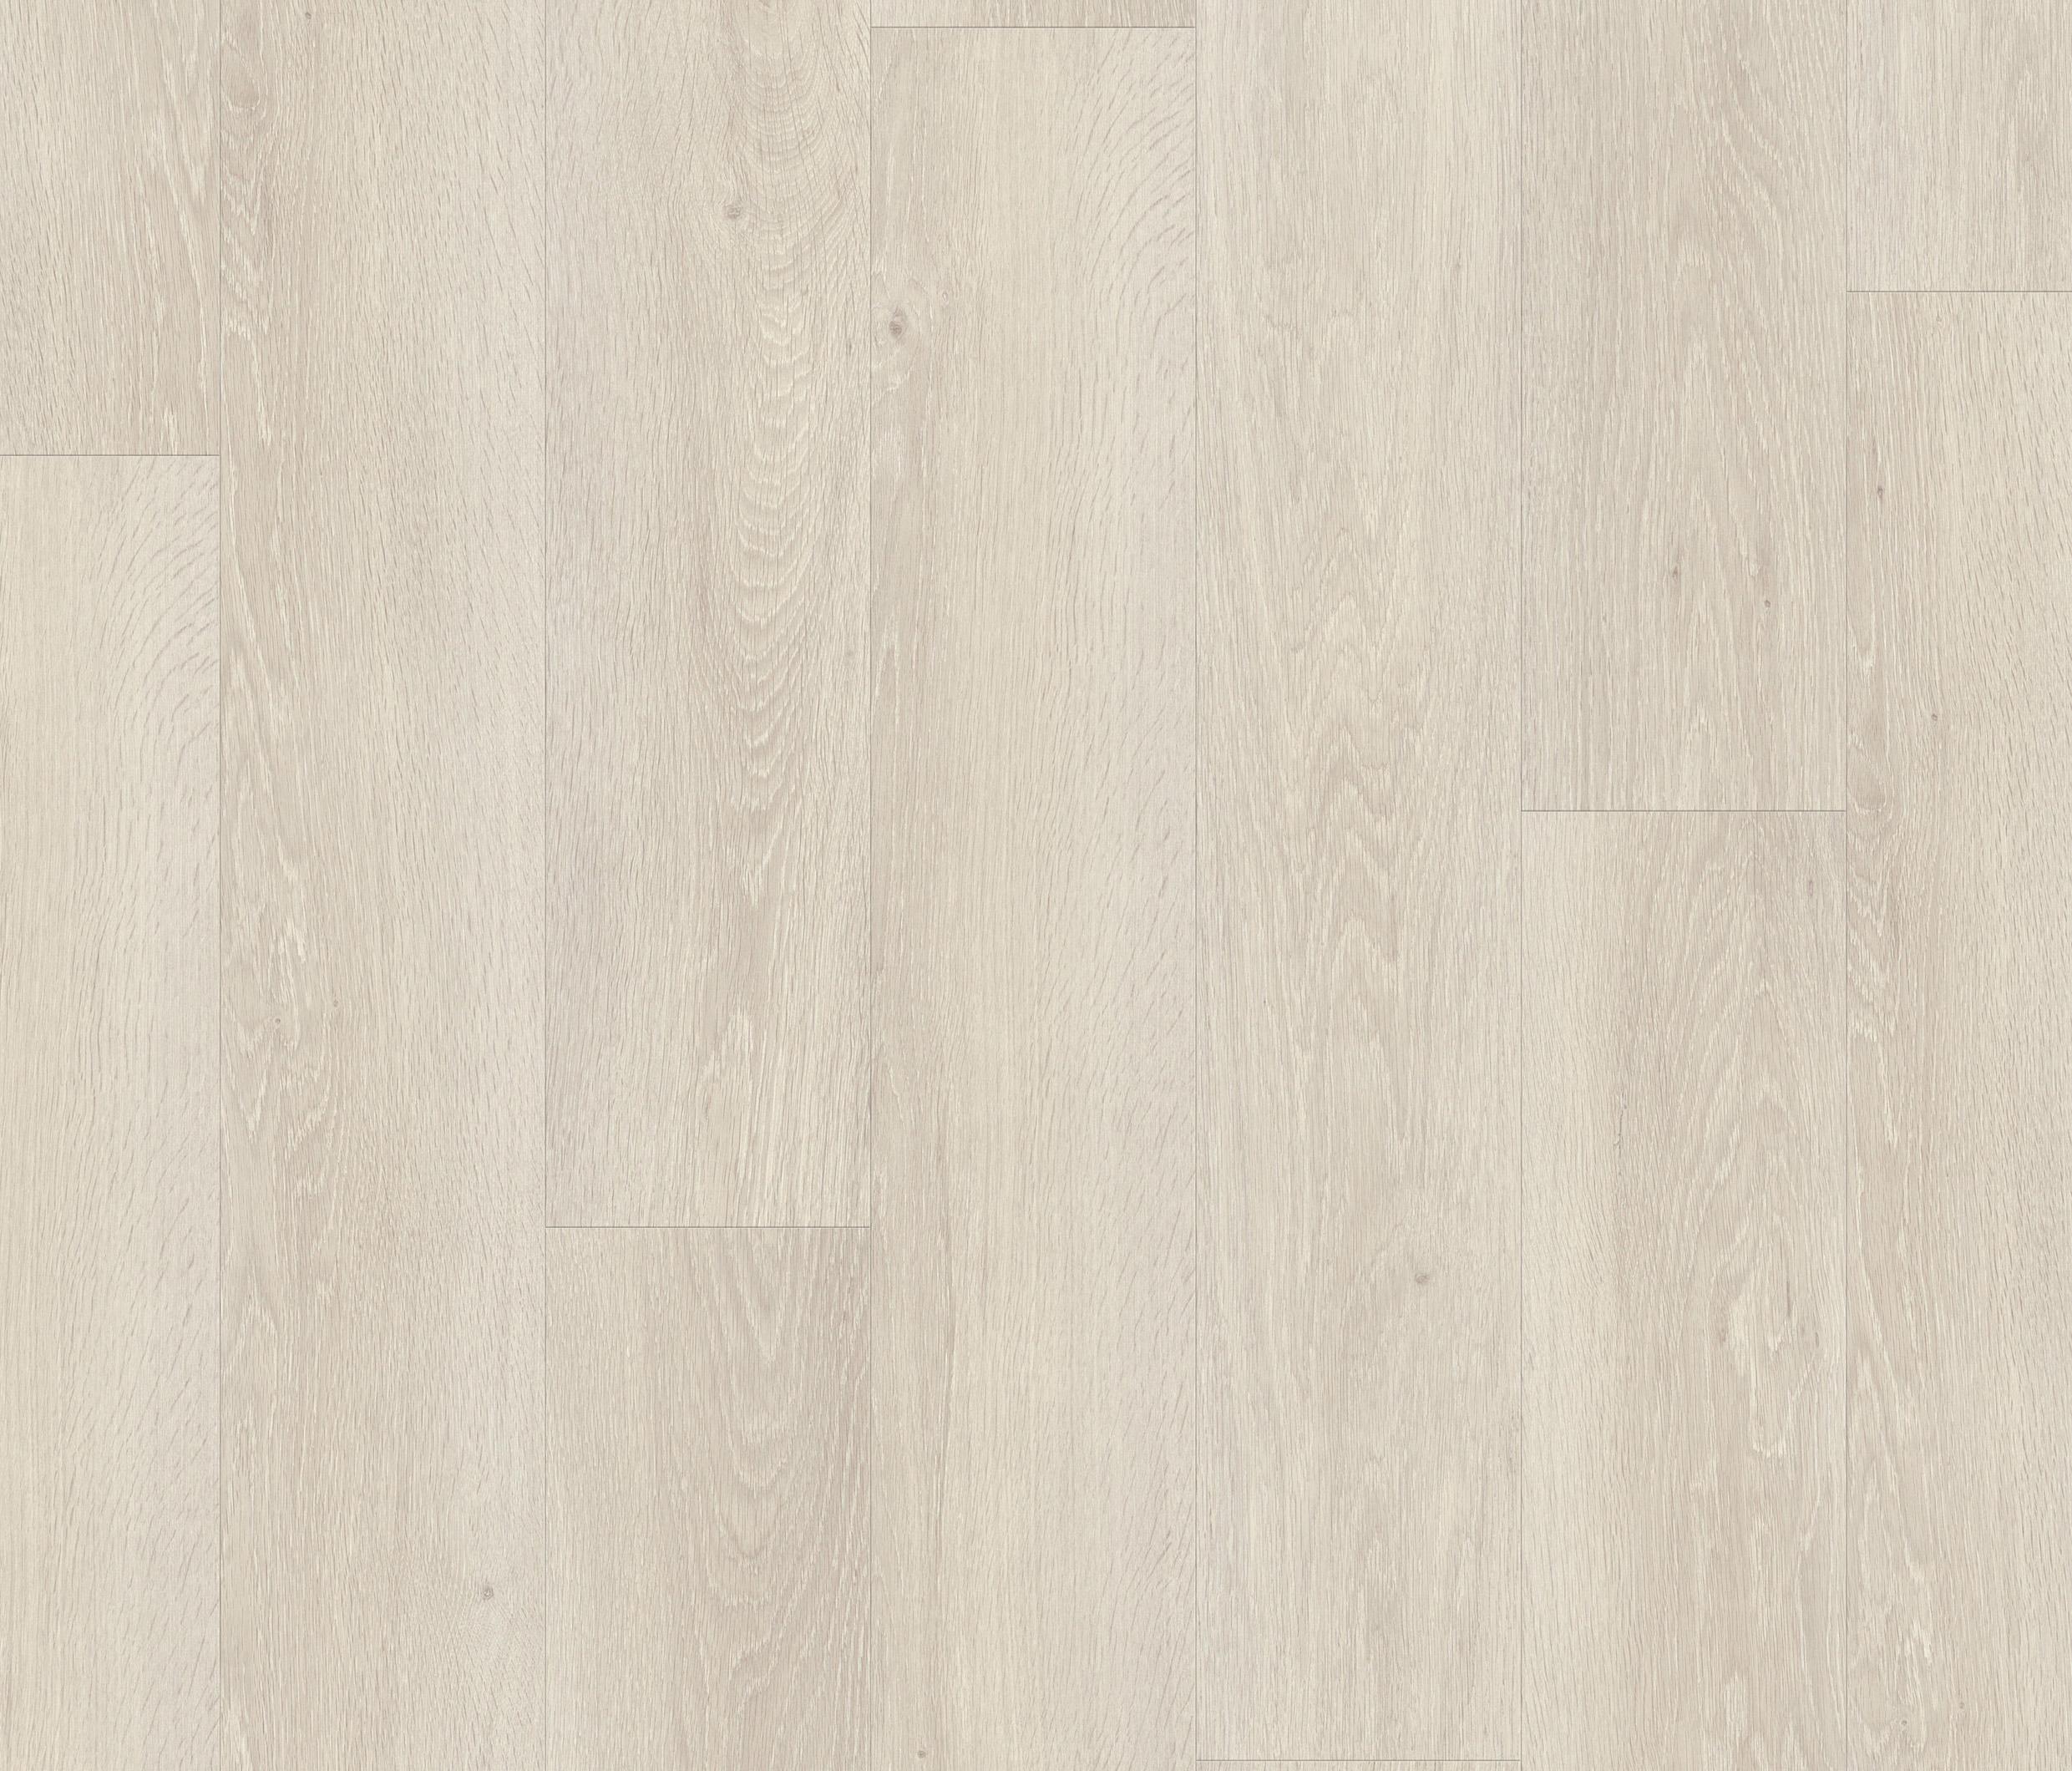 Modern Plank Vinyl Light Washed Oak Laminate Flooring